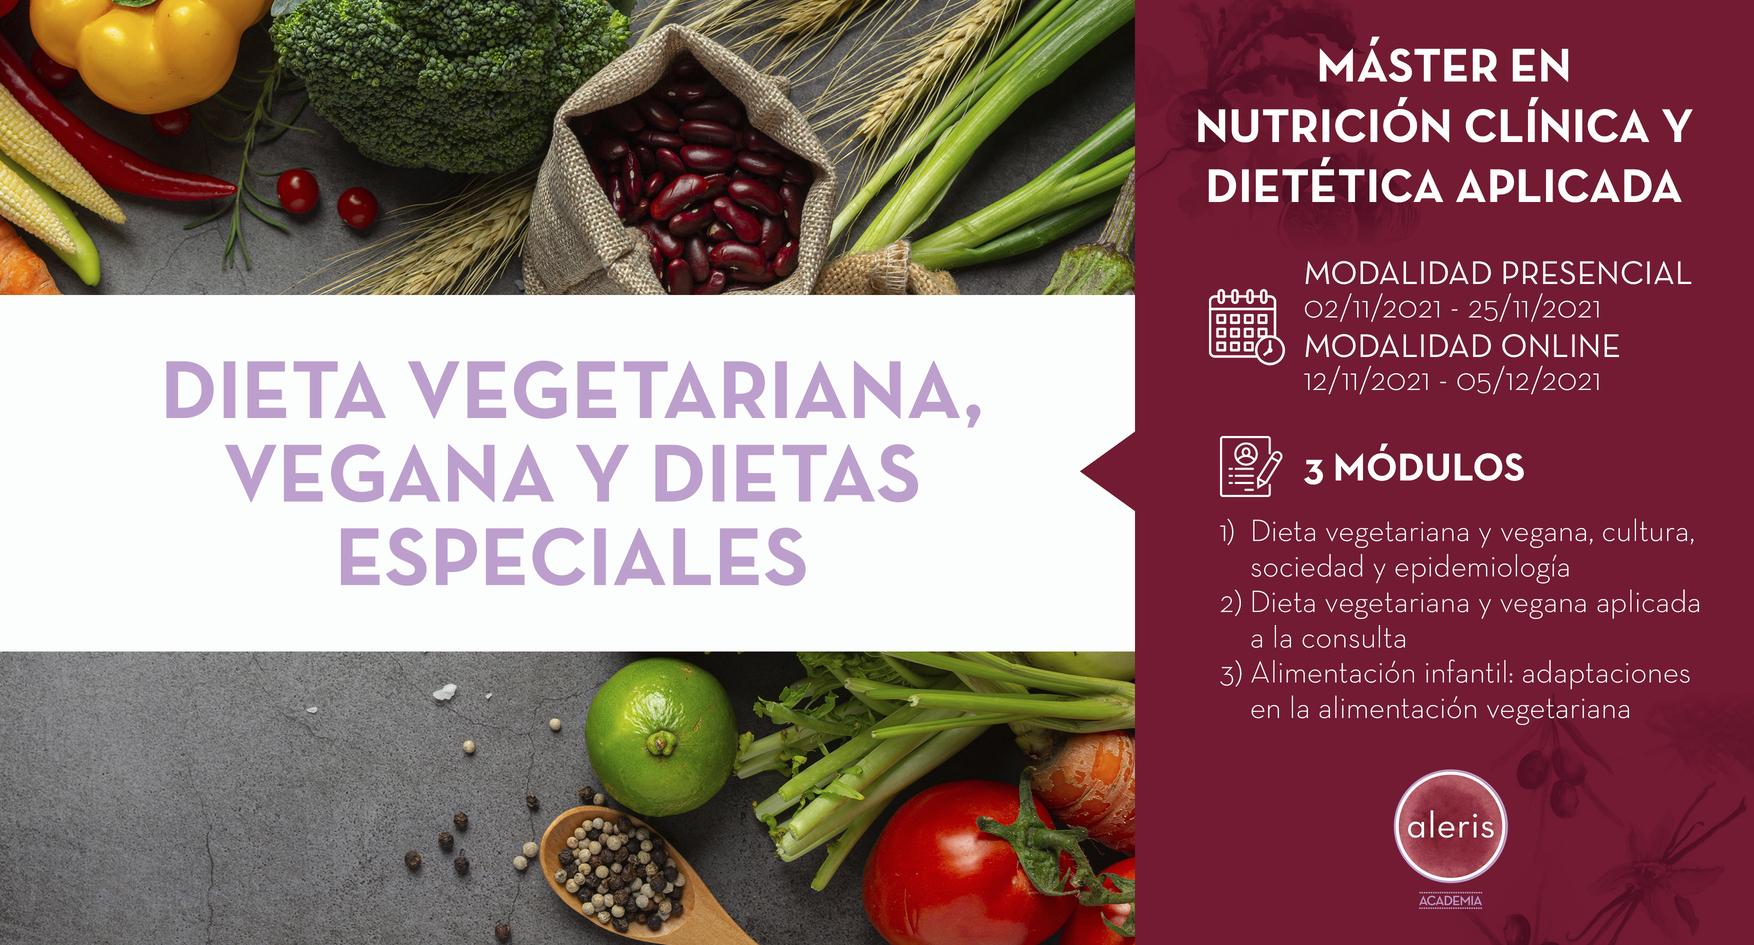 DIETA VEGETARIANA, VEGANA Y DIETAS ESPECIALES